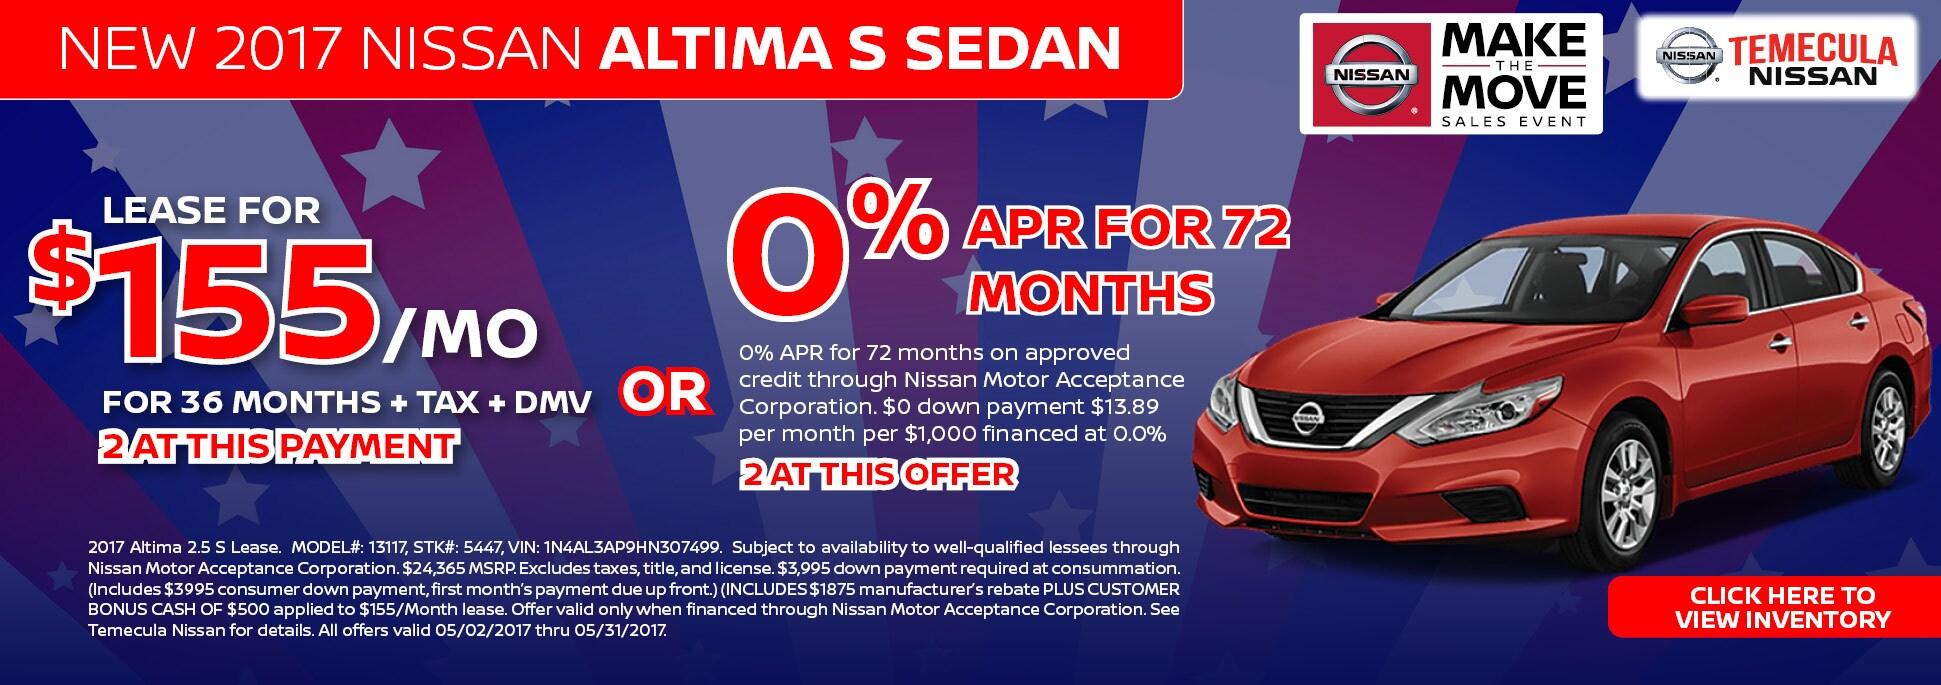 Nissan Motor Acceptance Corporation Phone Number Customer